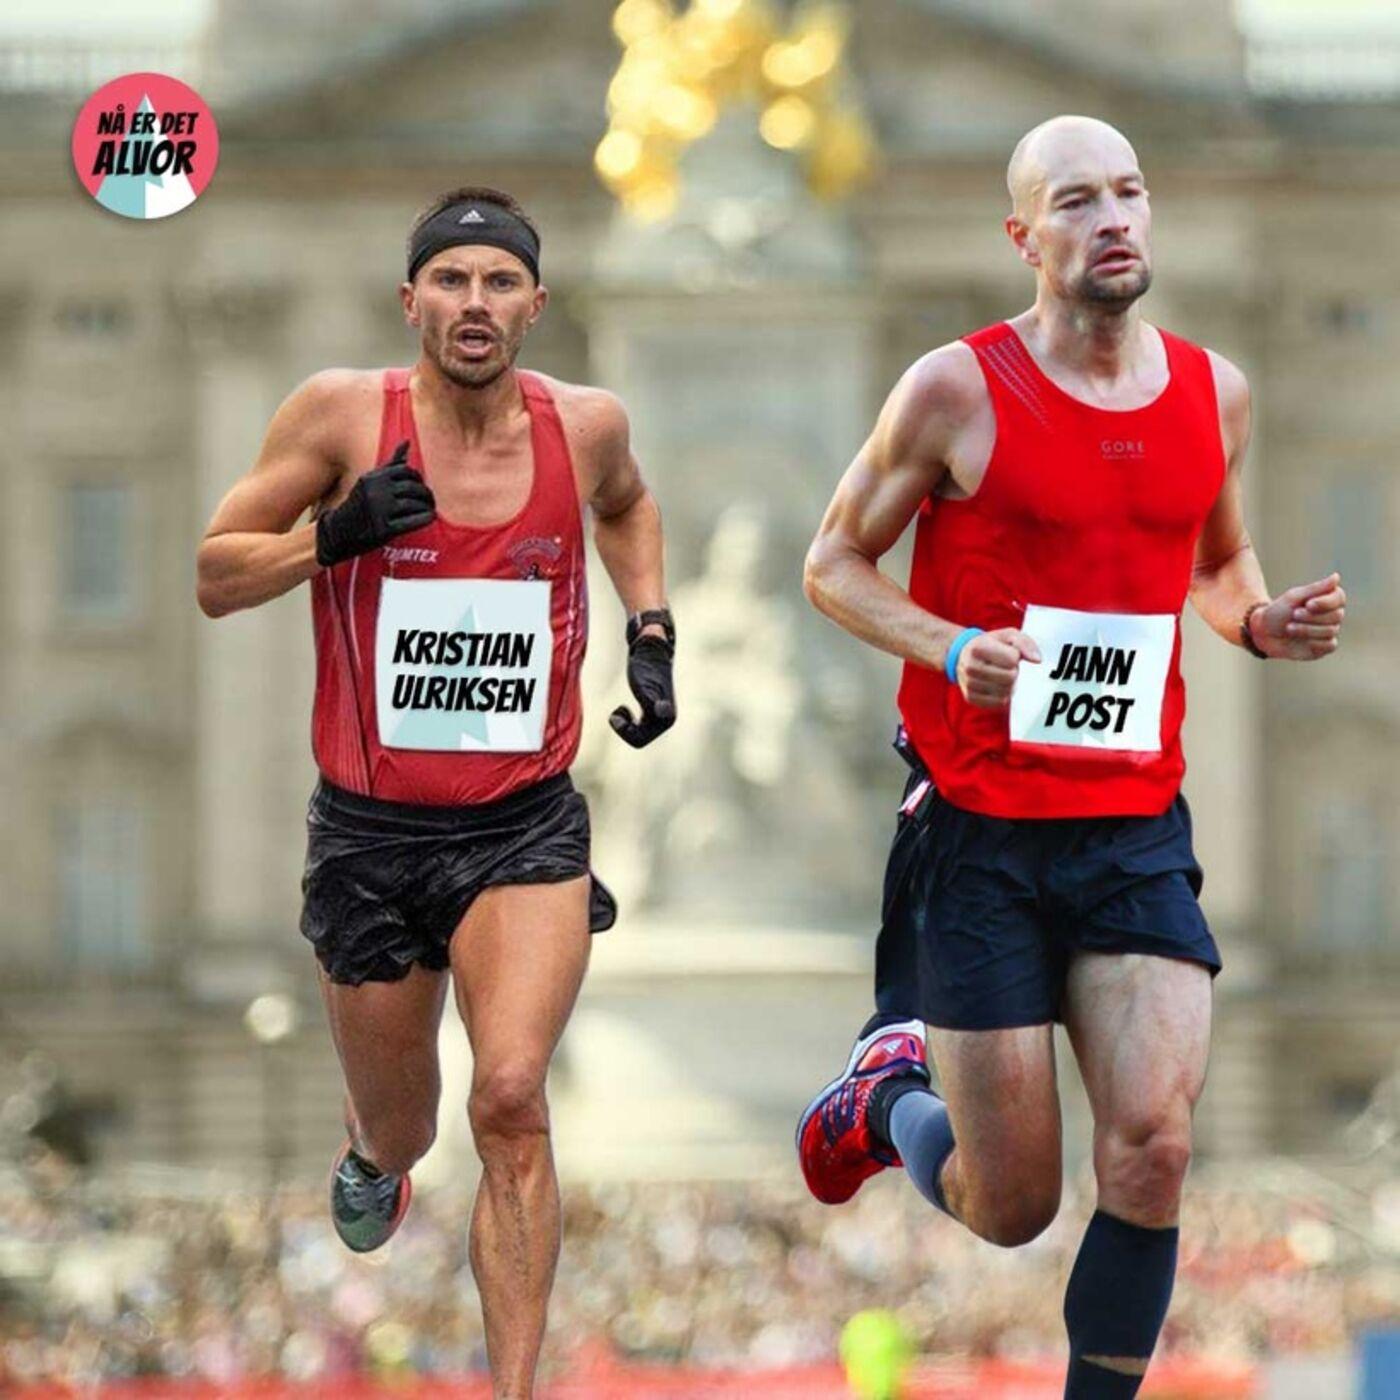 #122 - Jann Post & Kristian Ulriksen | Breaking Podcast Limits